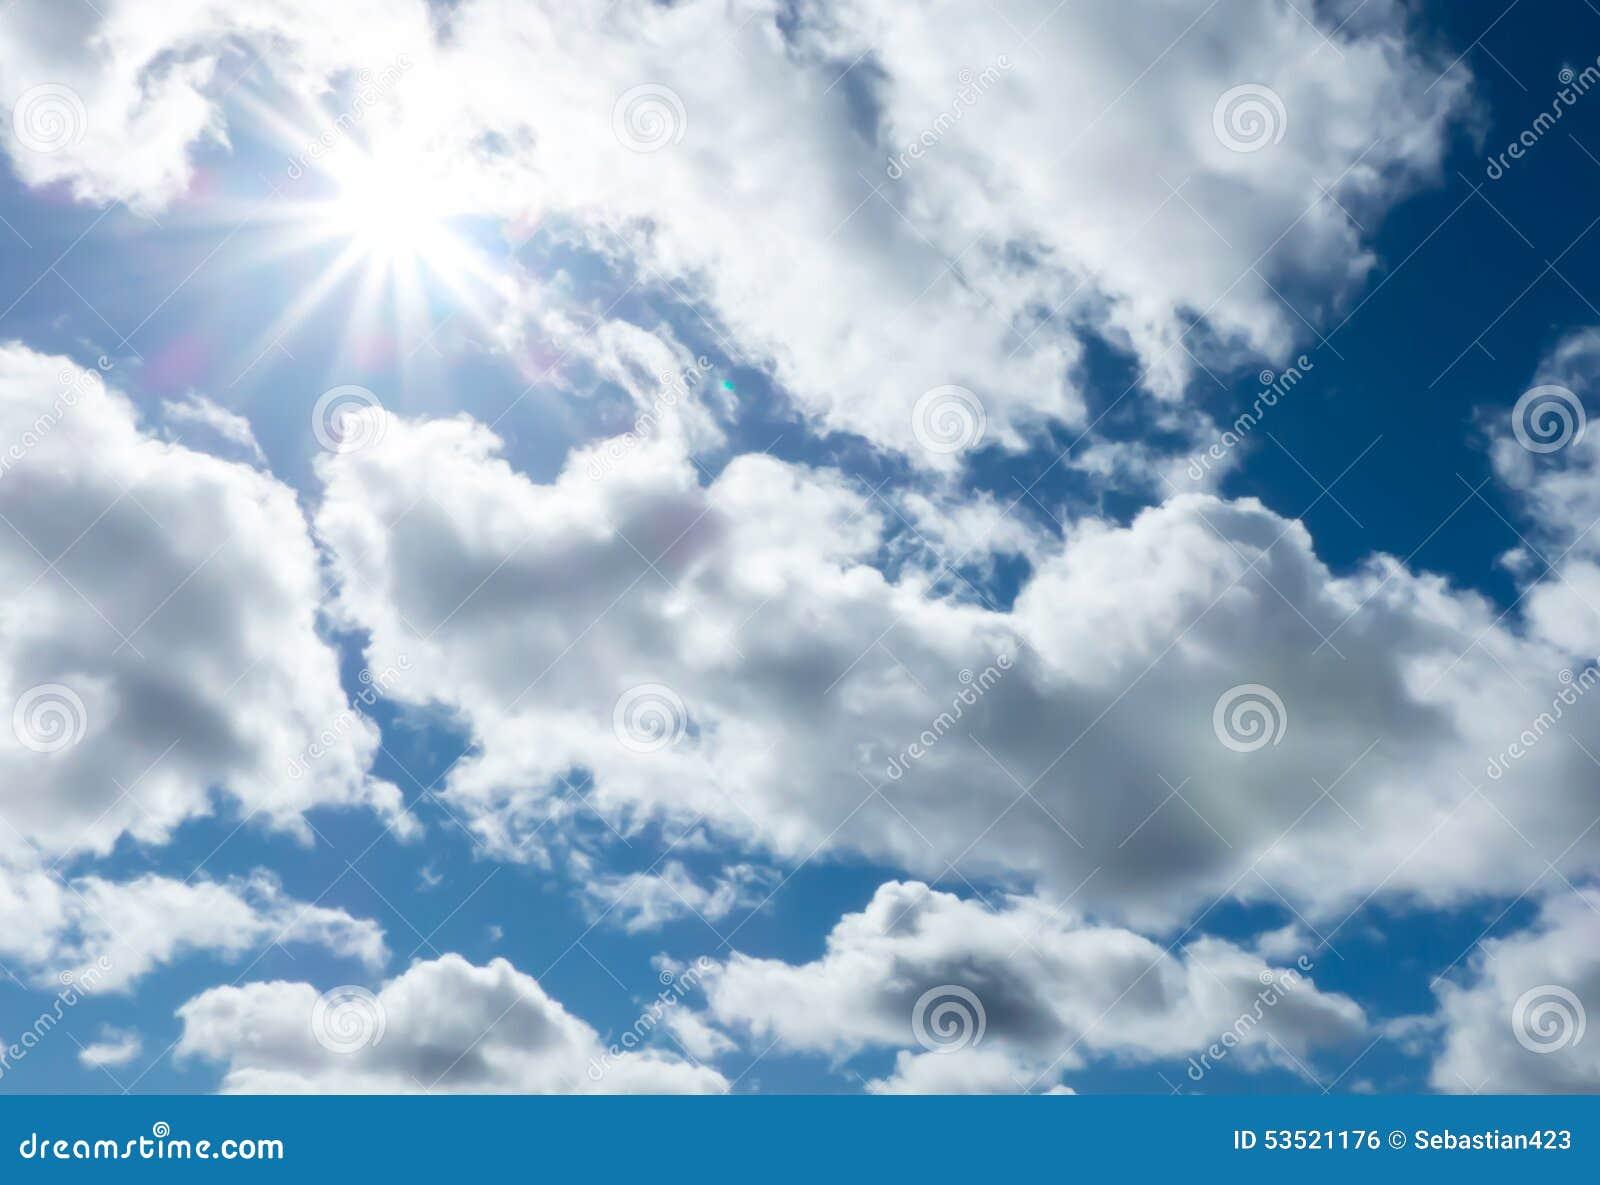 Clouds blue sky and sunshine